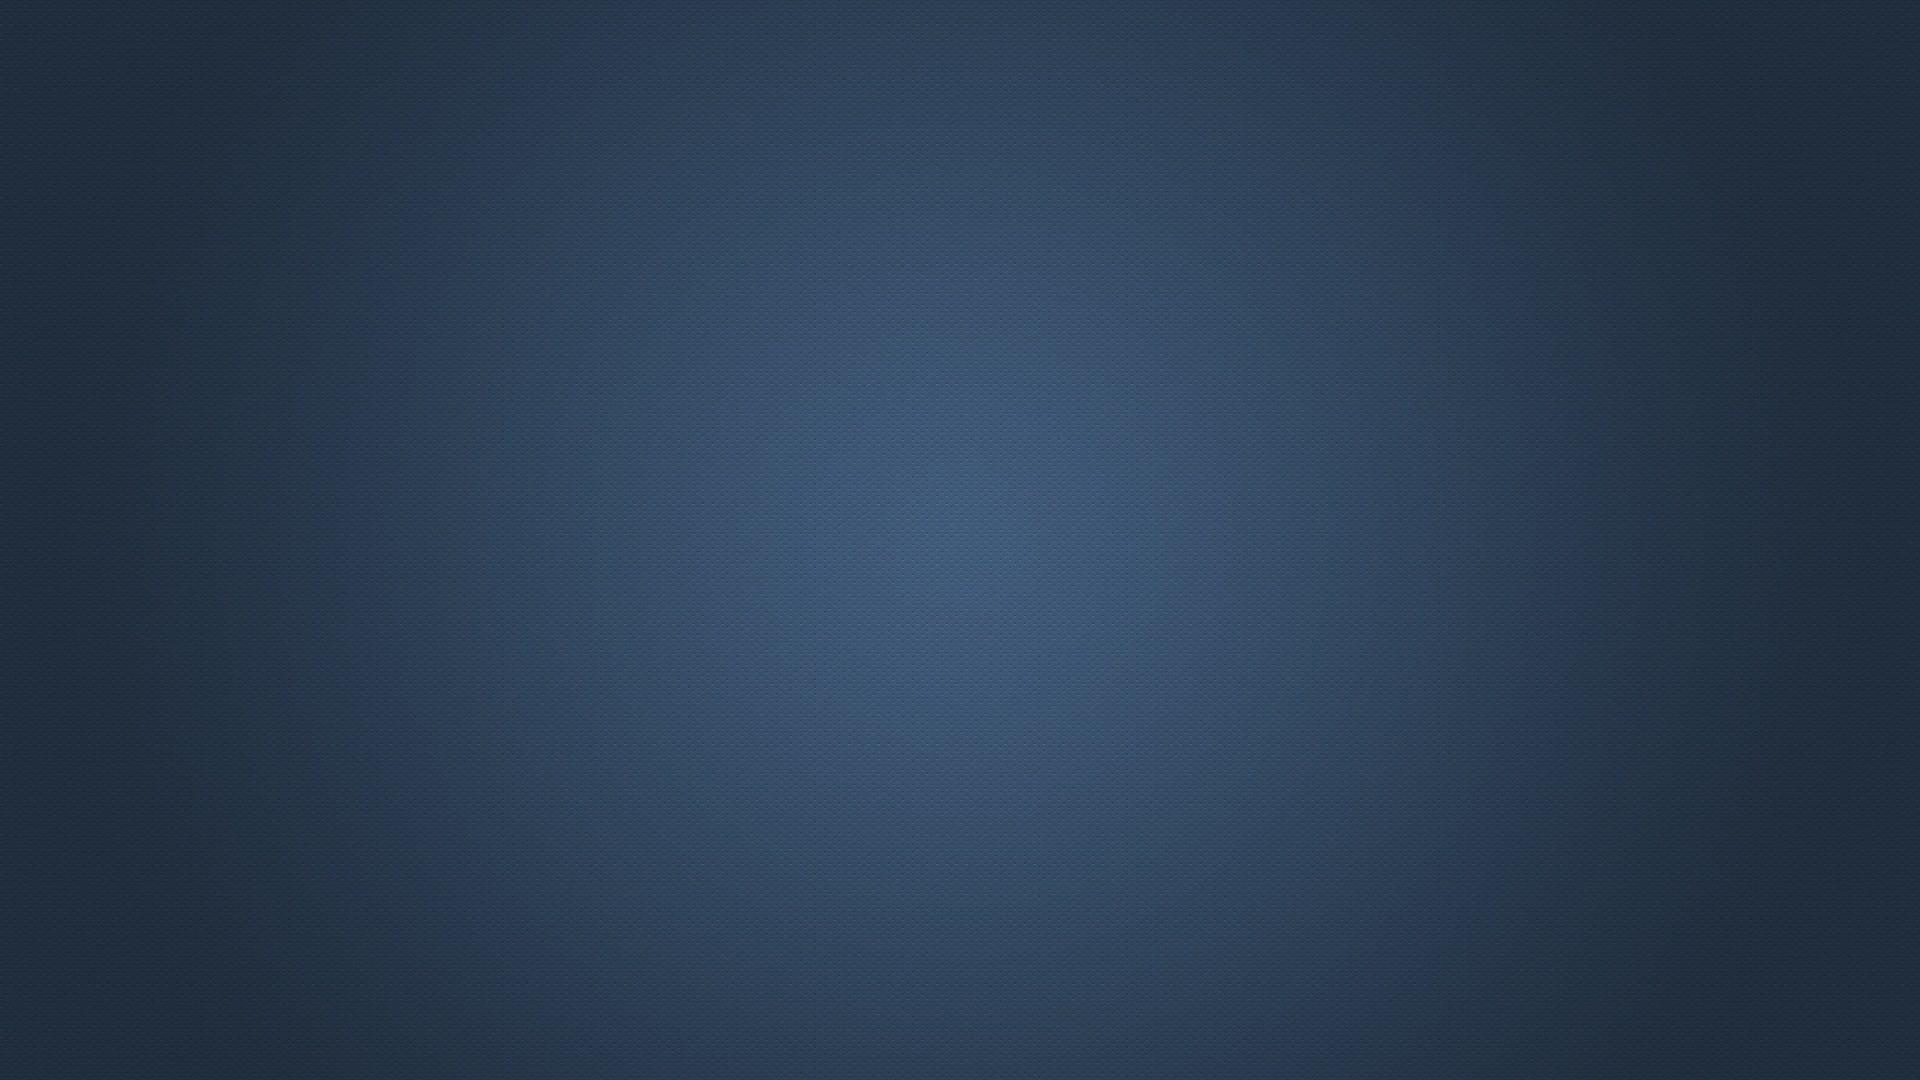 wallpaper dark blue pattern 1920×1080